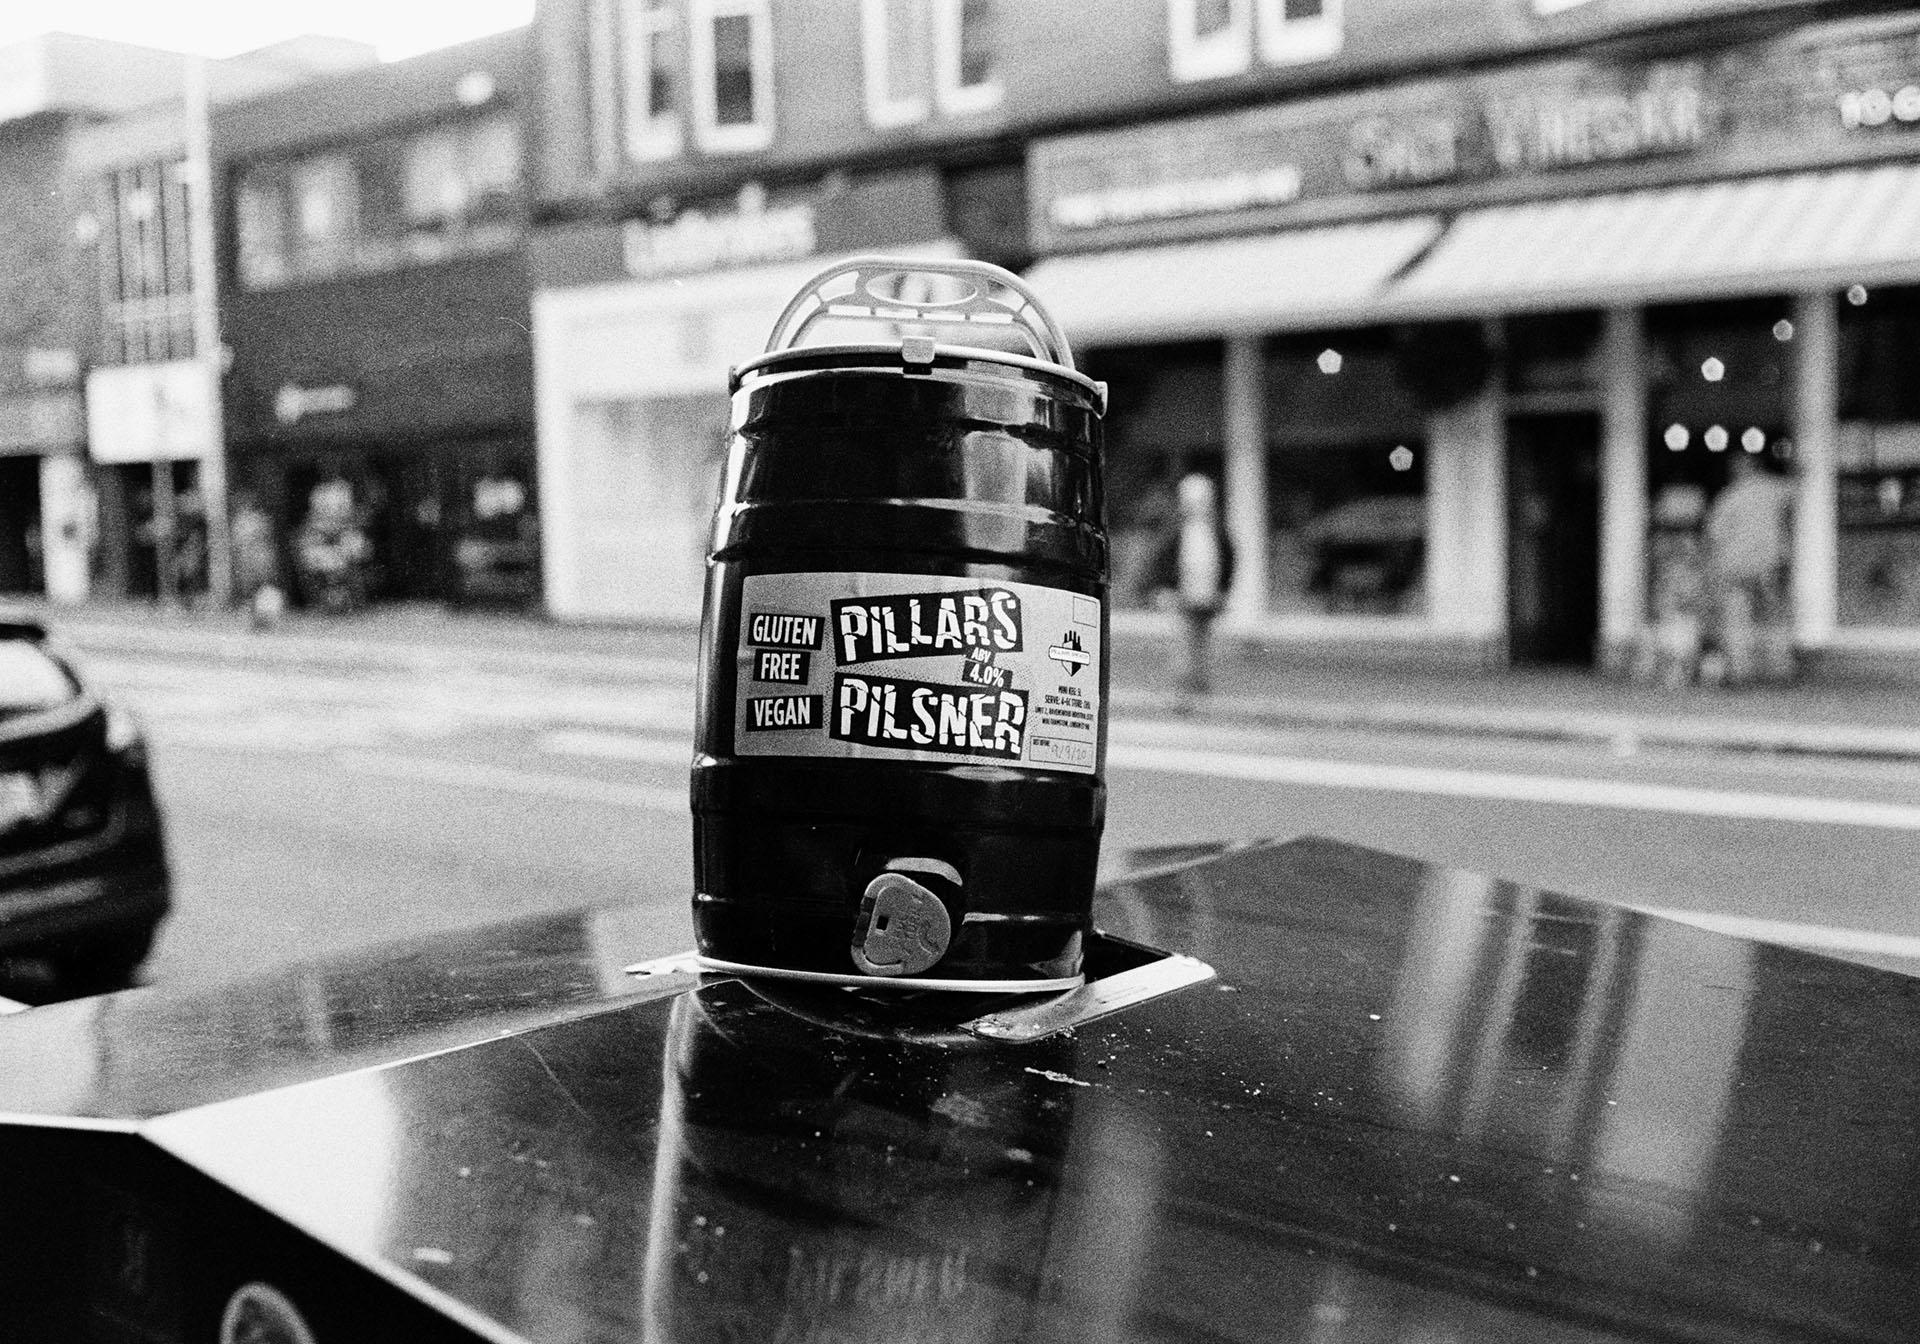 Glasgow 35mm film